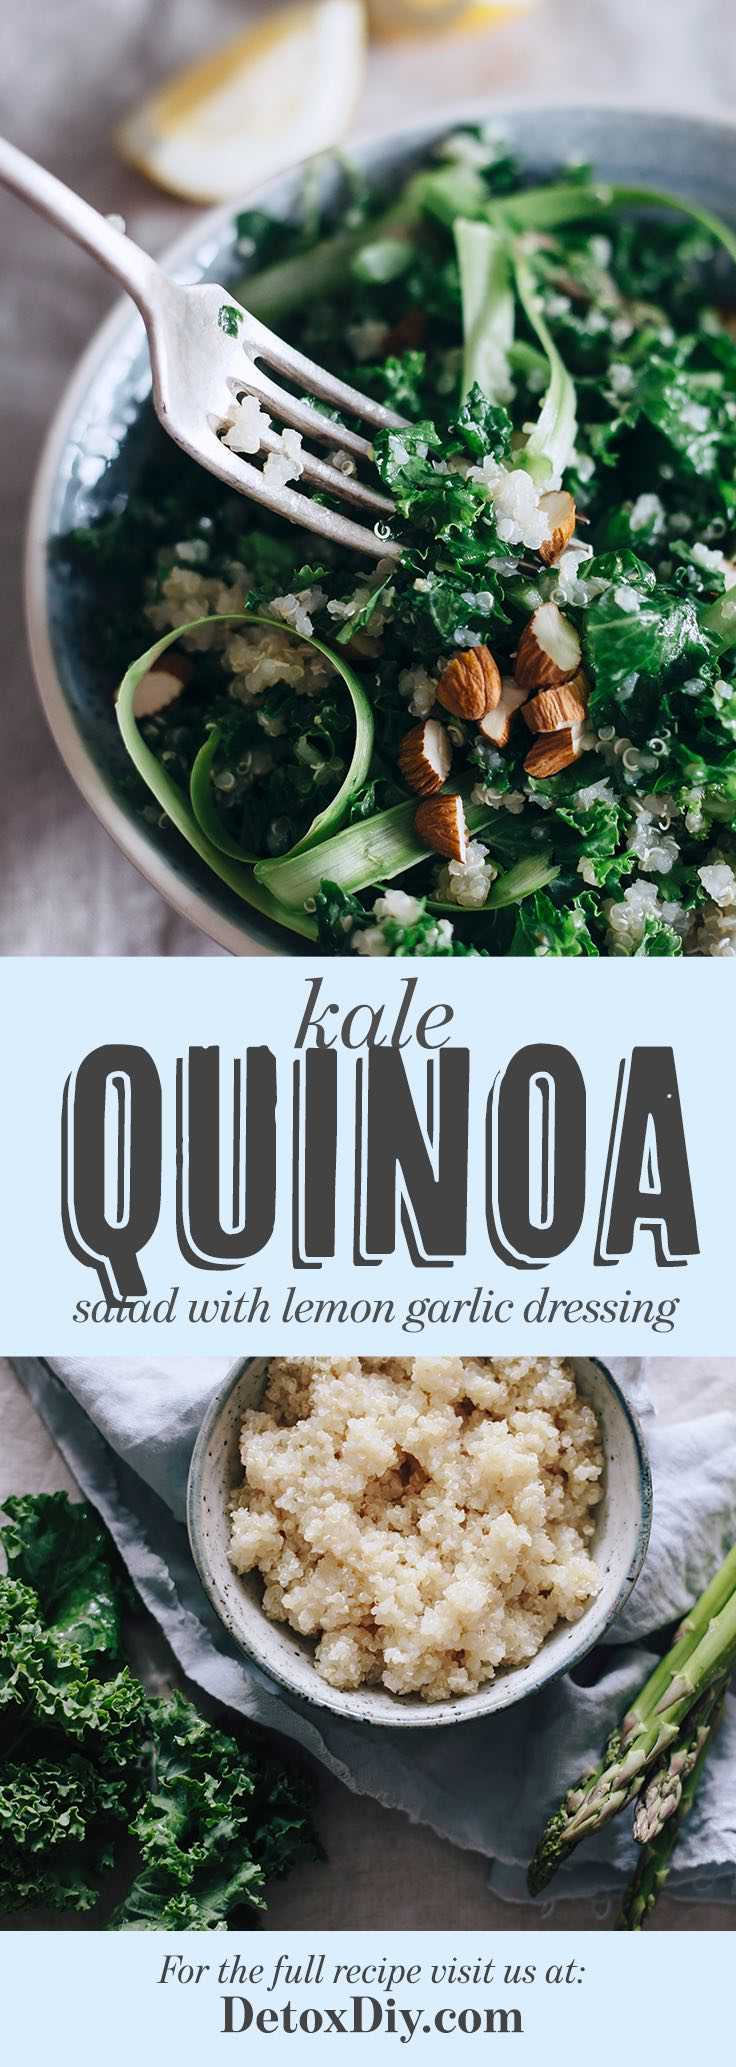 The Best Kale Quinoa Salad with Lemon Garlic Dressing